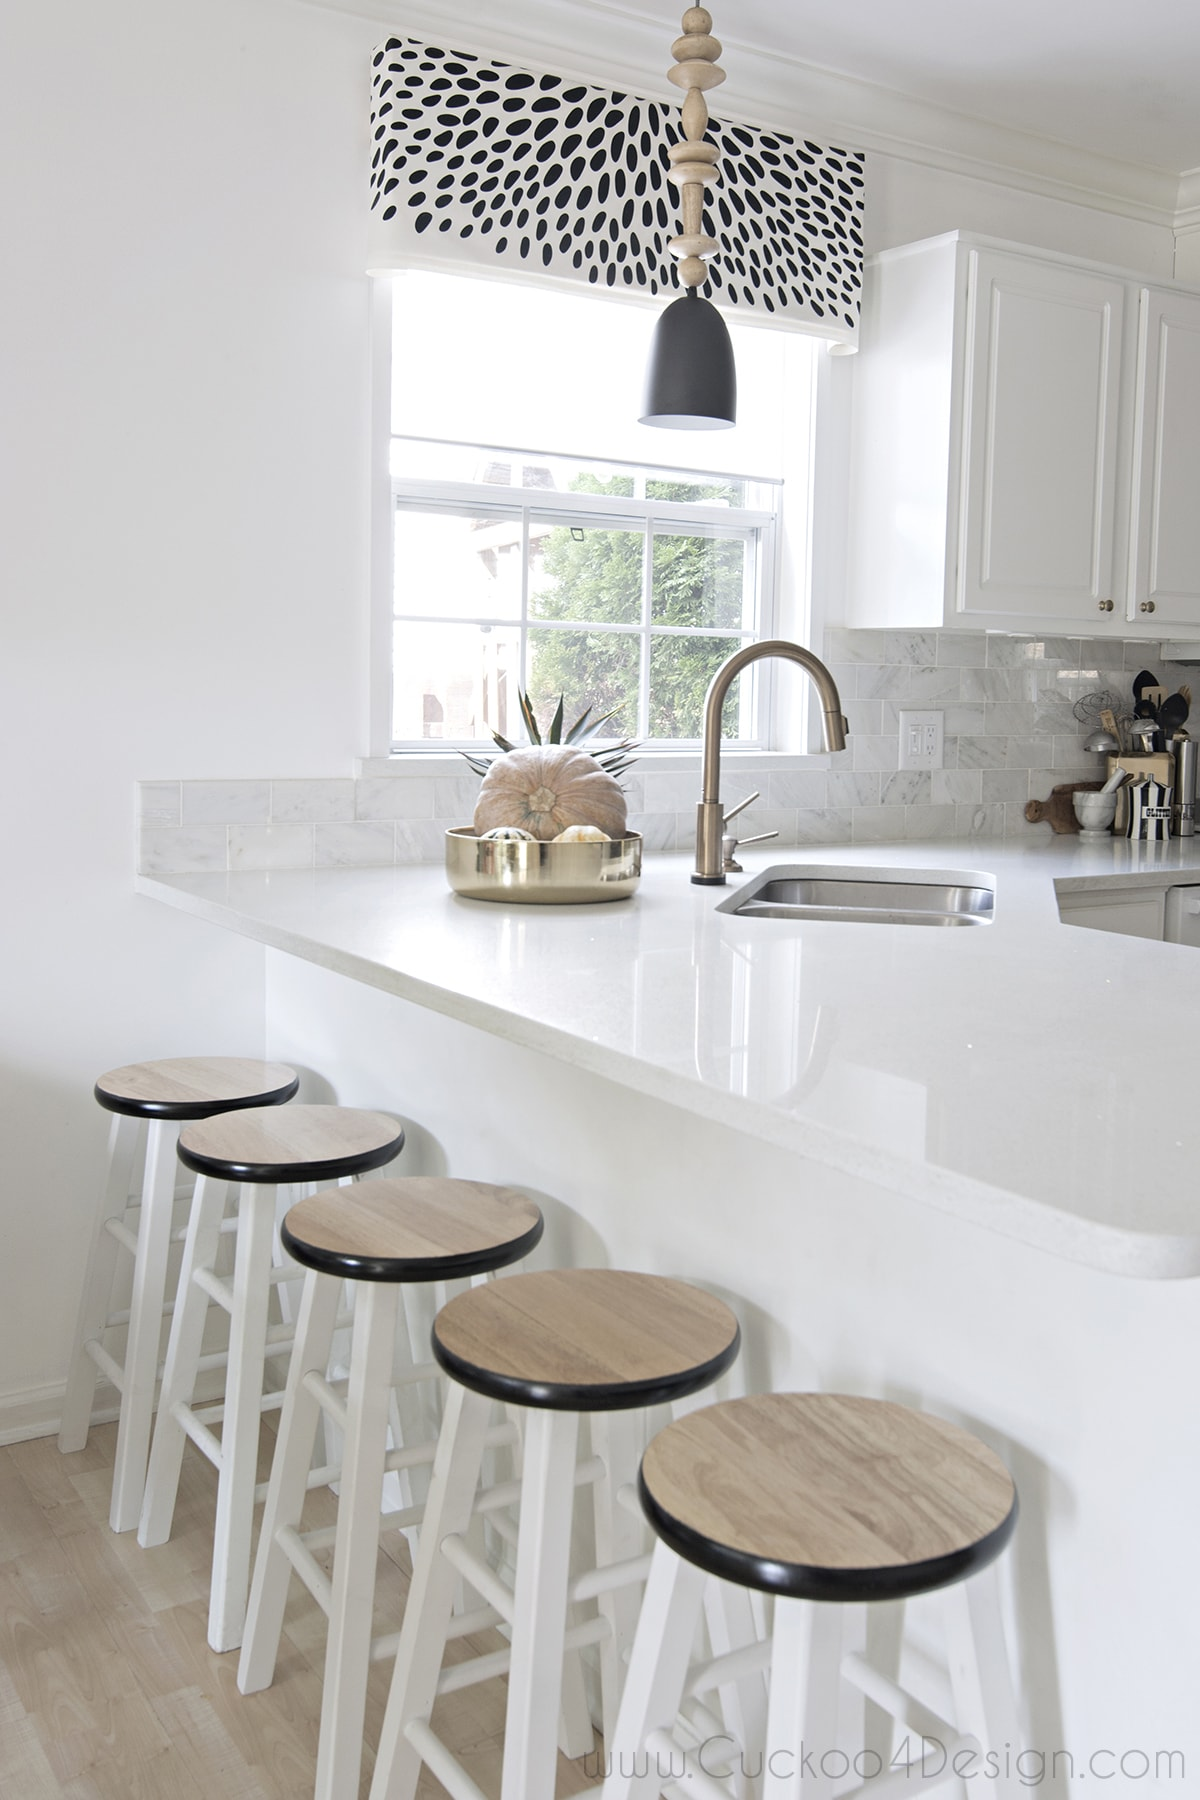 black_white_and_gold_kitchen_cuckoo4design